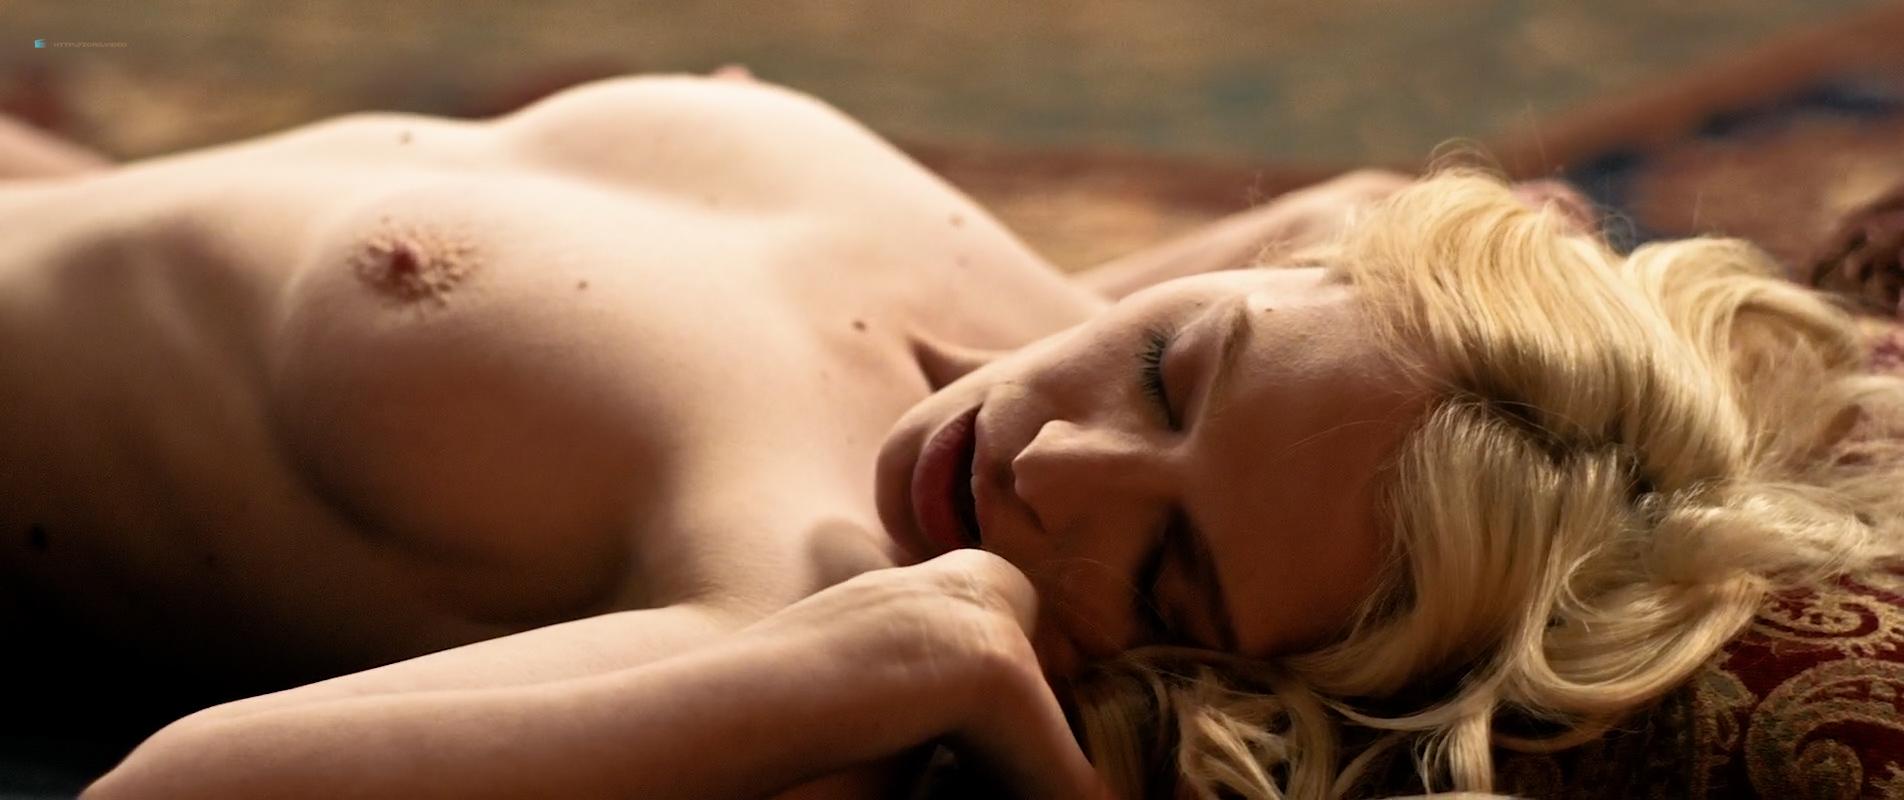 chloe-agnew-nude